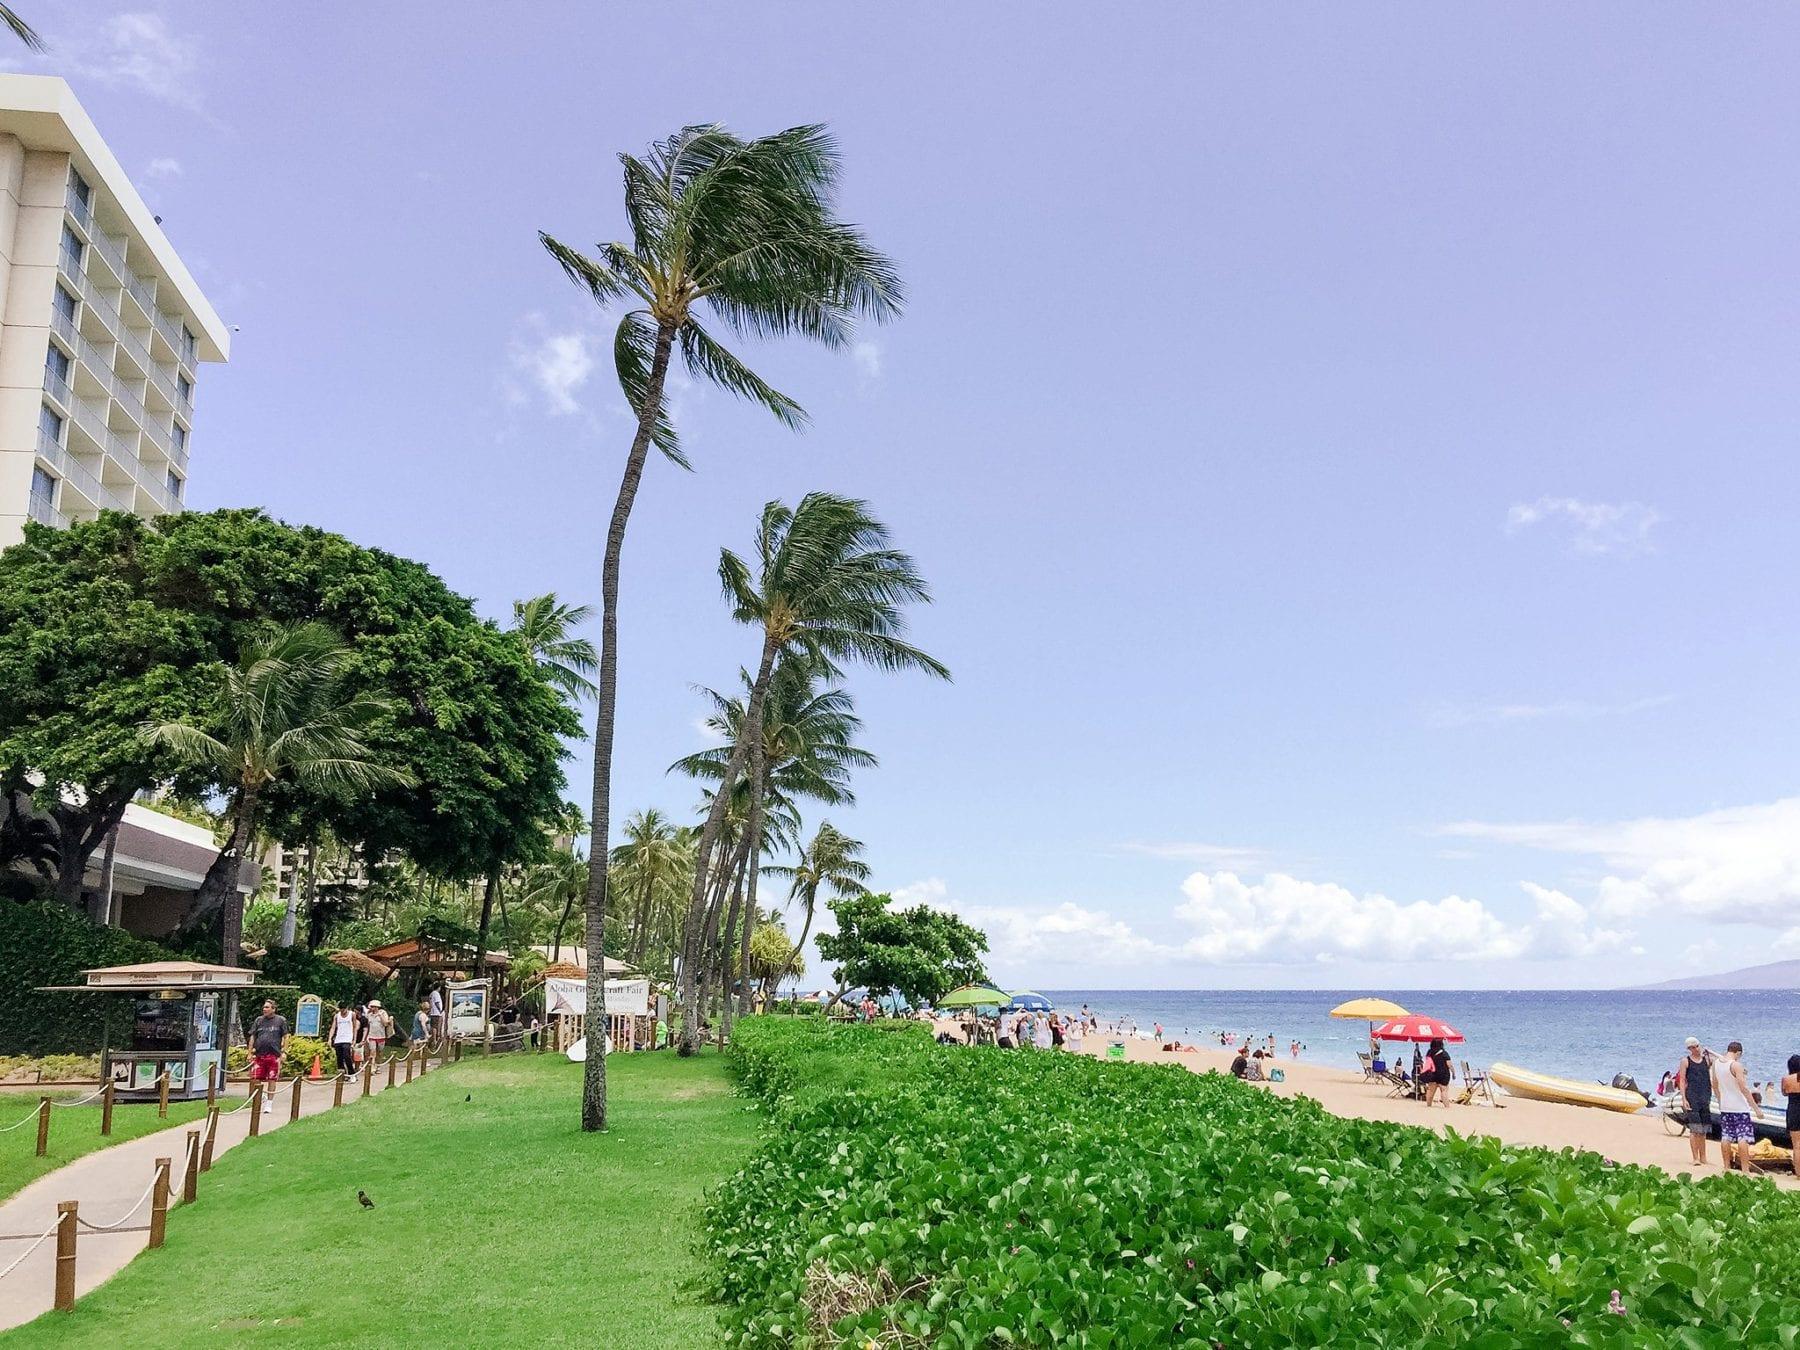 Hawaii Honeymoon Photos Megan & Justin Maui Vacation Things To Do iPhone-24.jpg